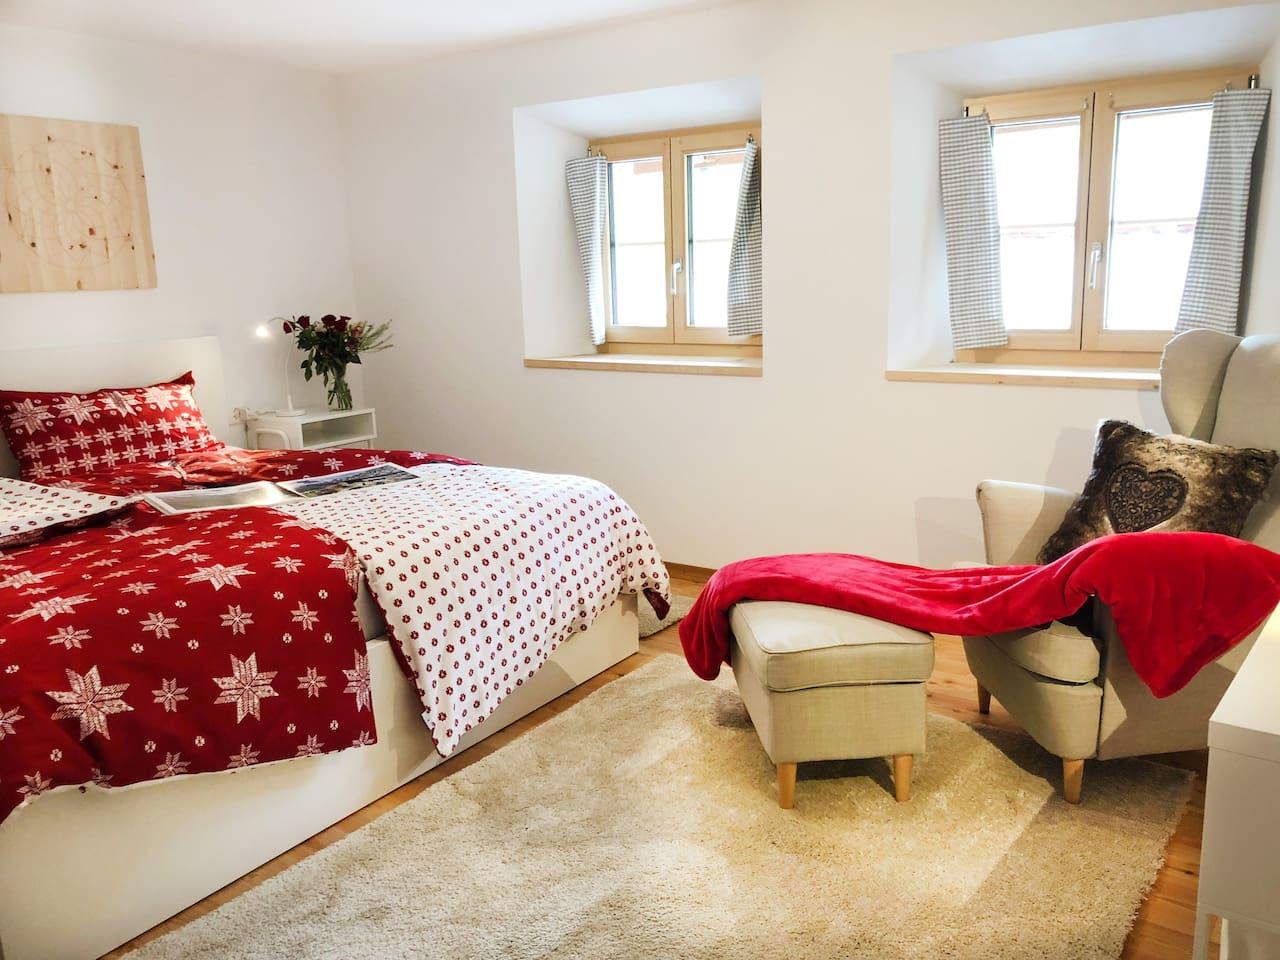 Bedroom 2 - Bruno Matratzen - https://www.brunobett.de/ch/matratze